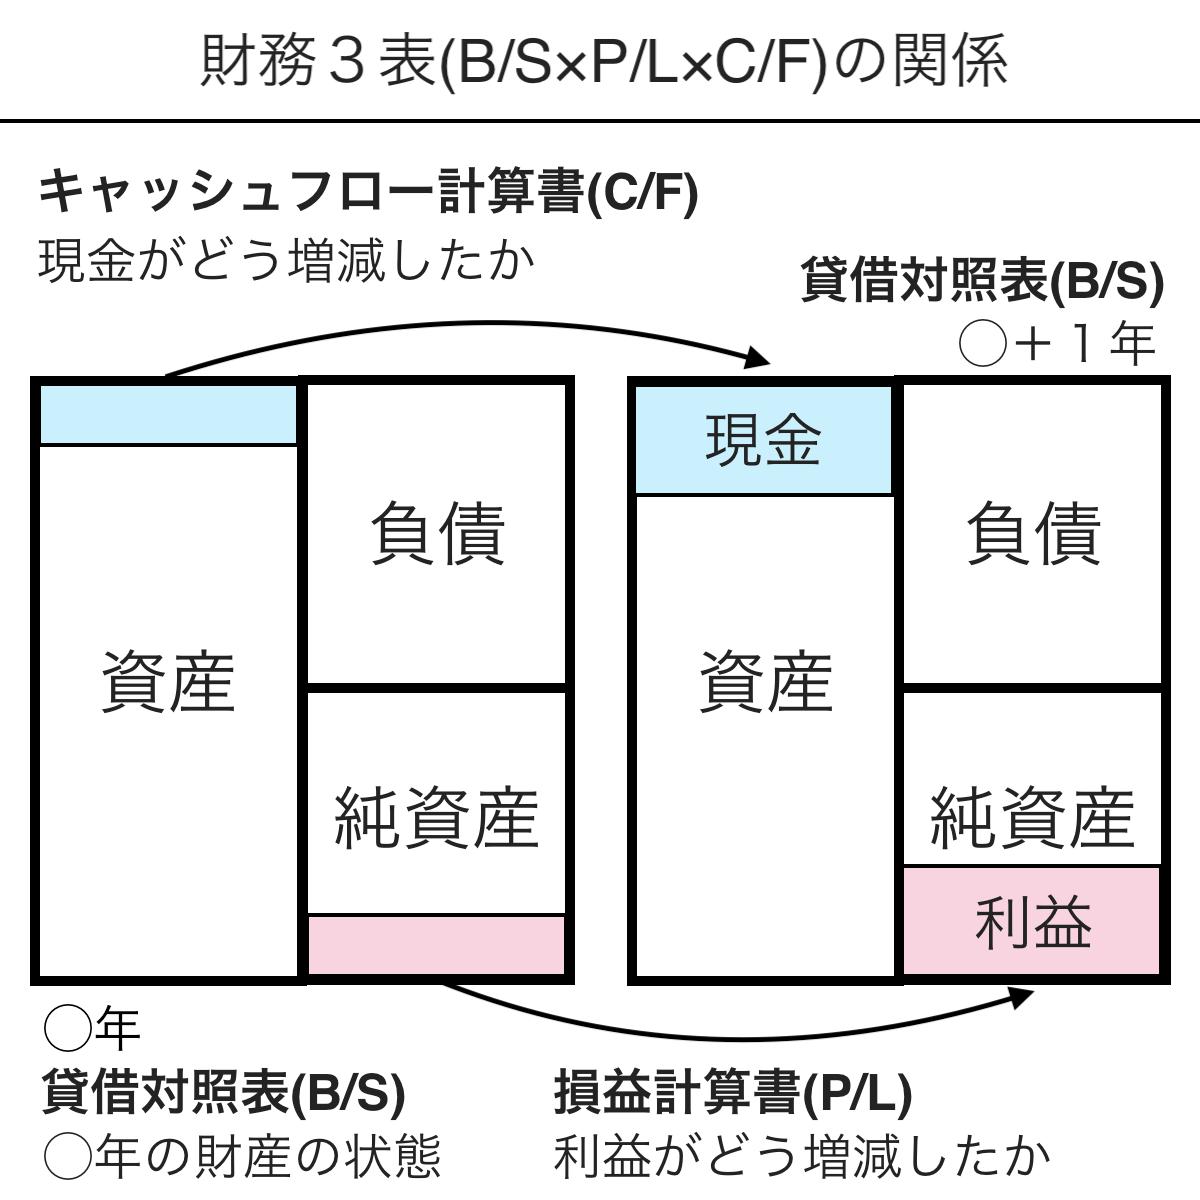 PL・BS・CFの関係